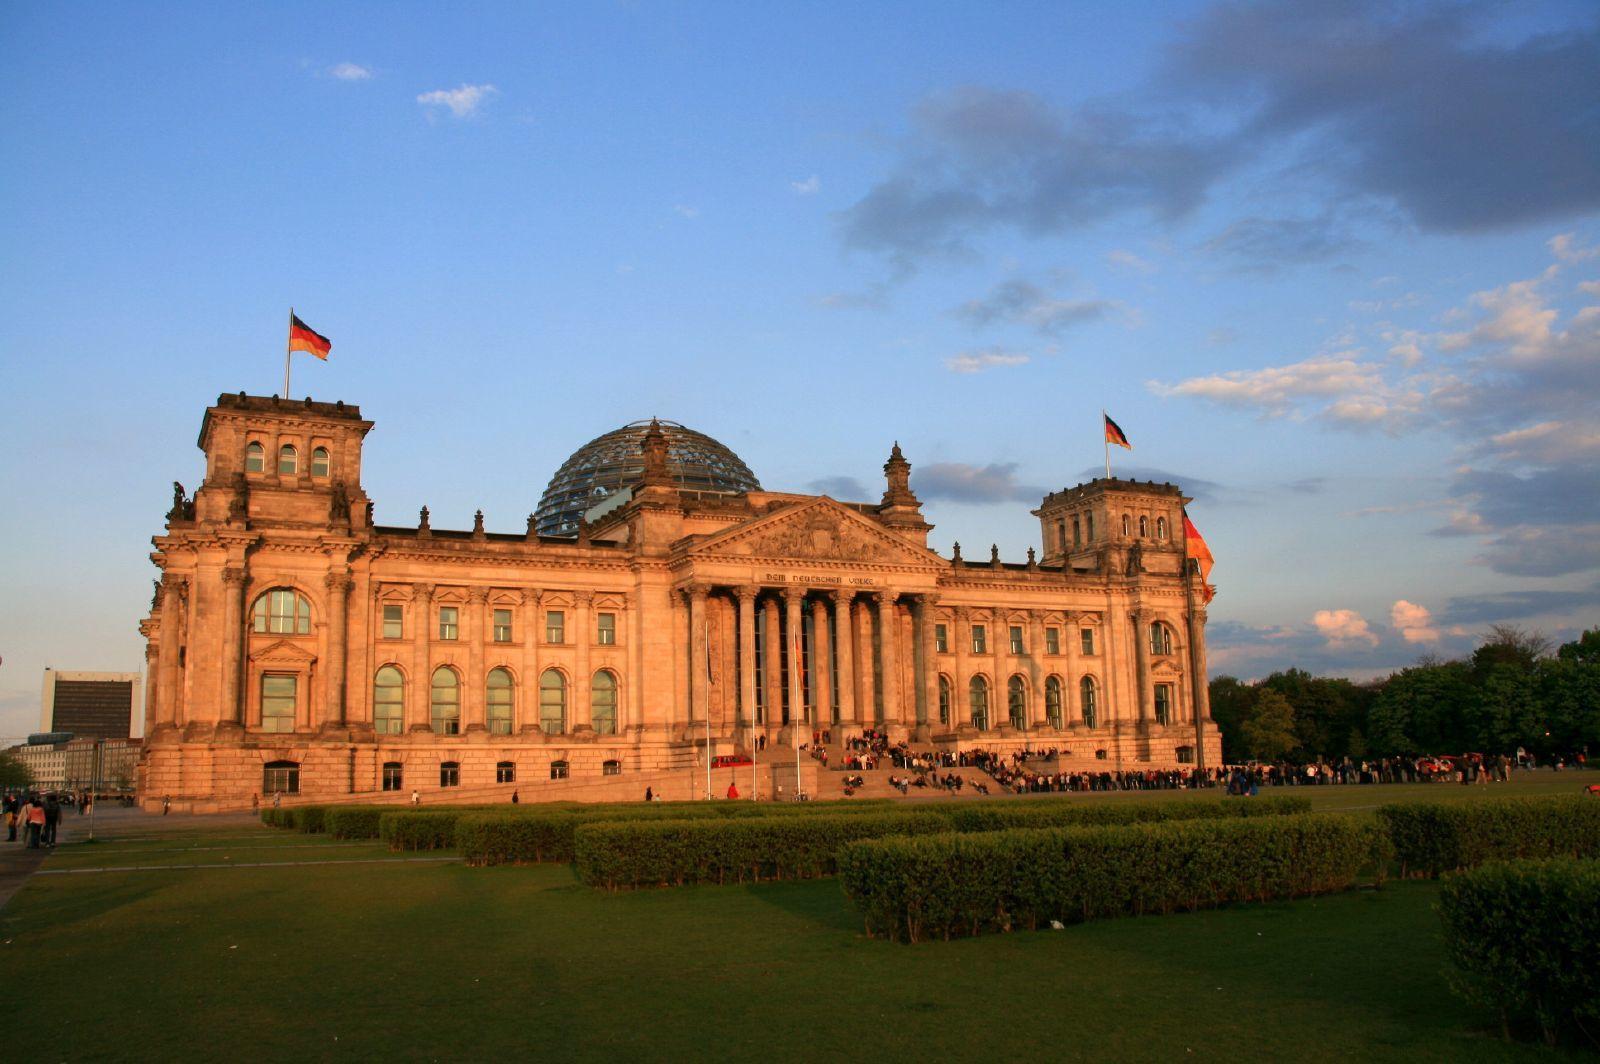 reichtag berlin germany in European Union